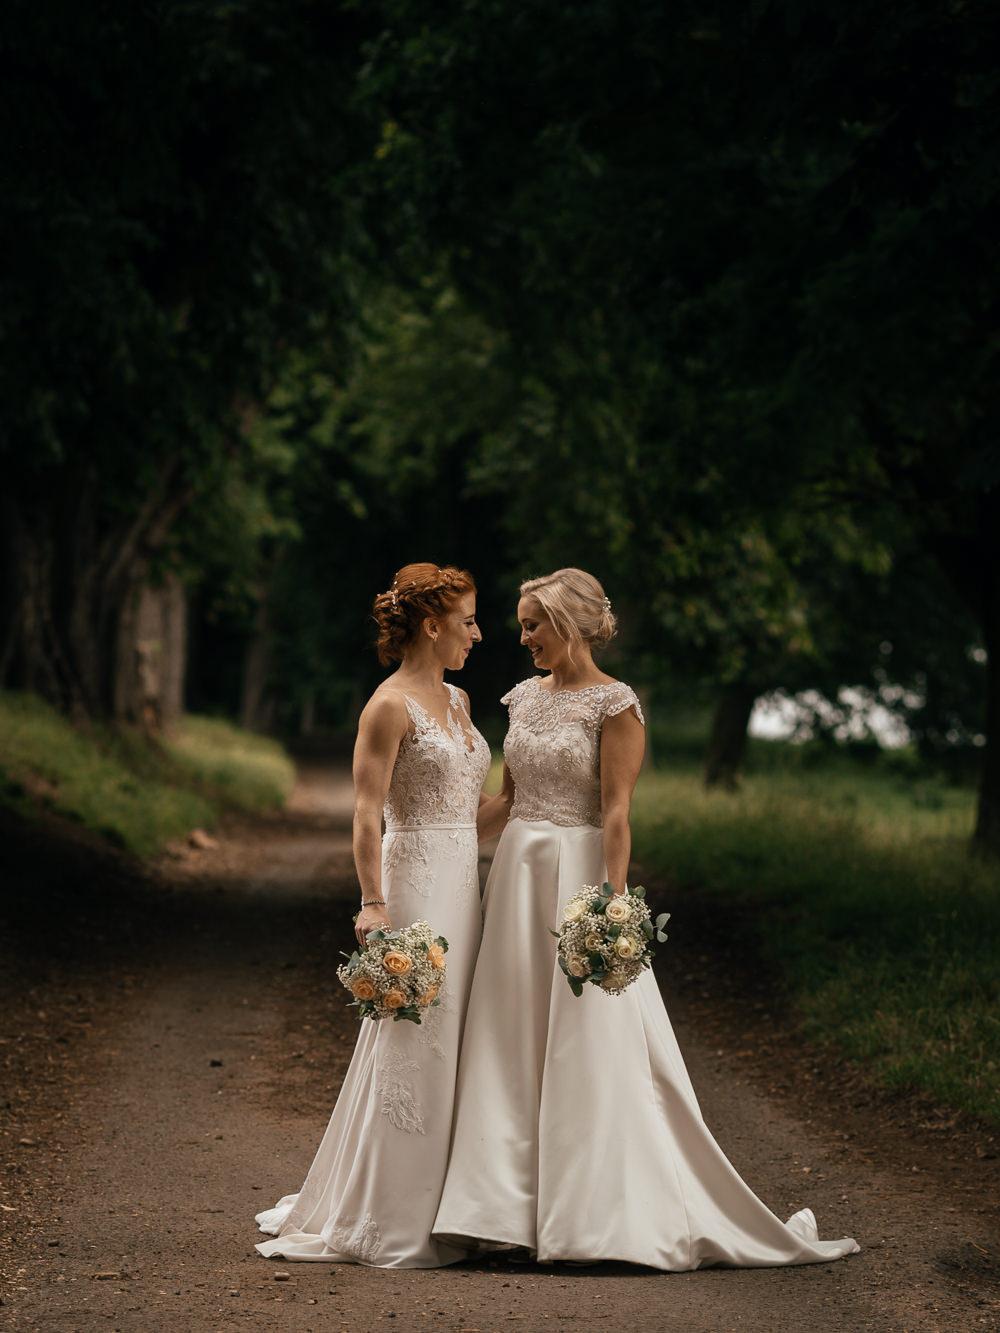 Bride Bridal Lace Embellished Dress Gown Cap Sleeve Halter Neck Mickleton Hills Farm Wedding Jules Barron Photography